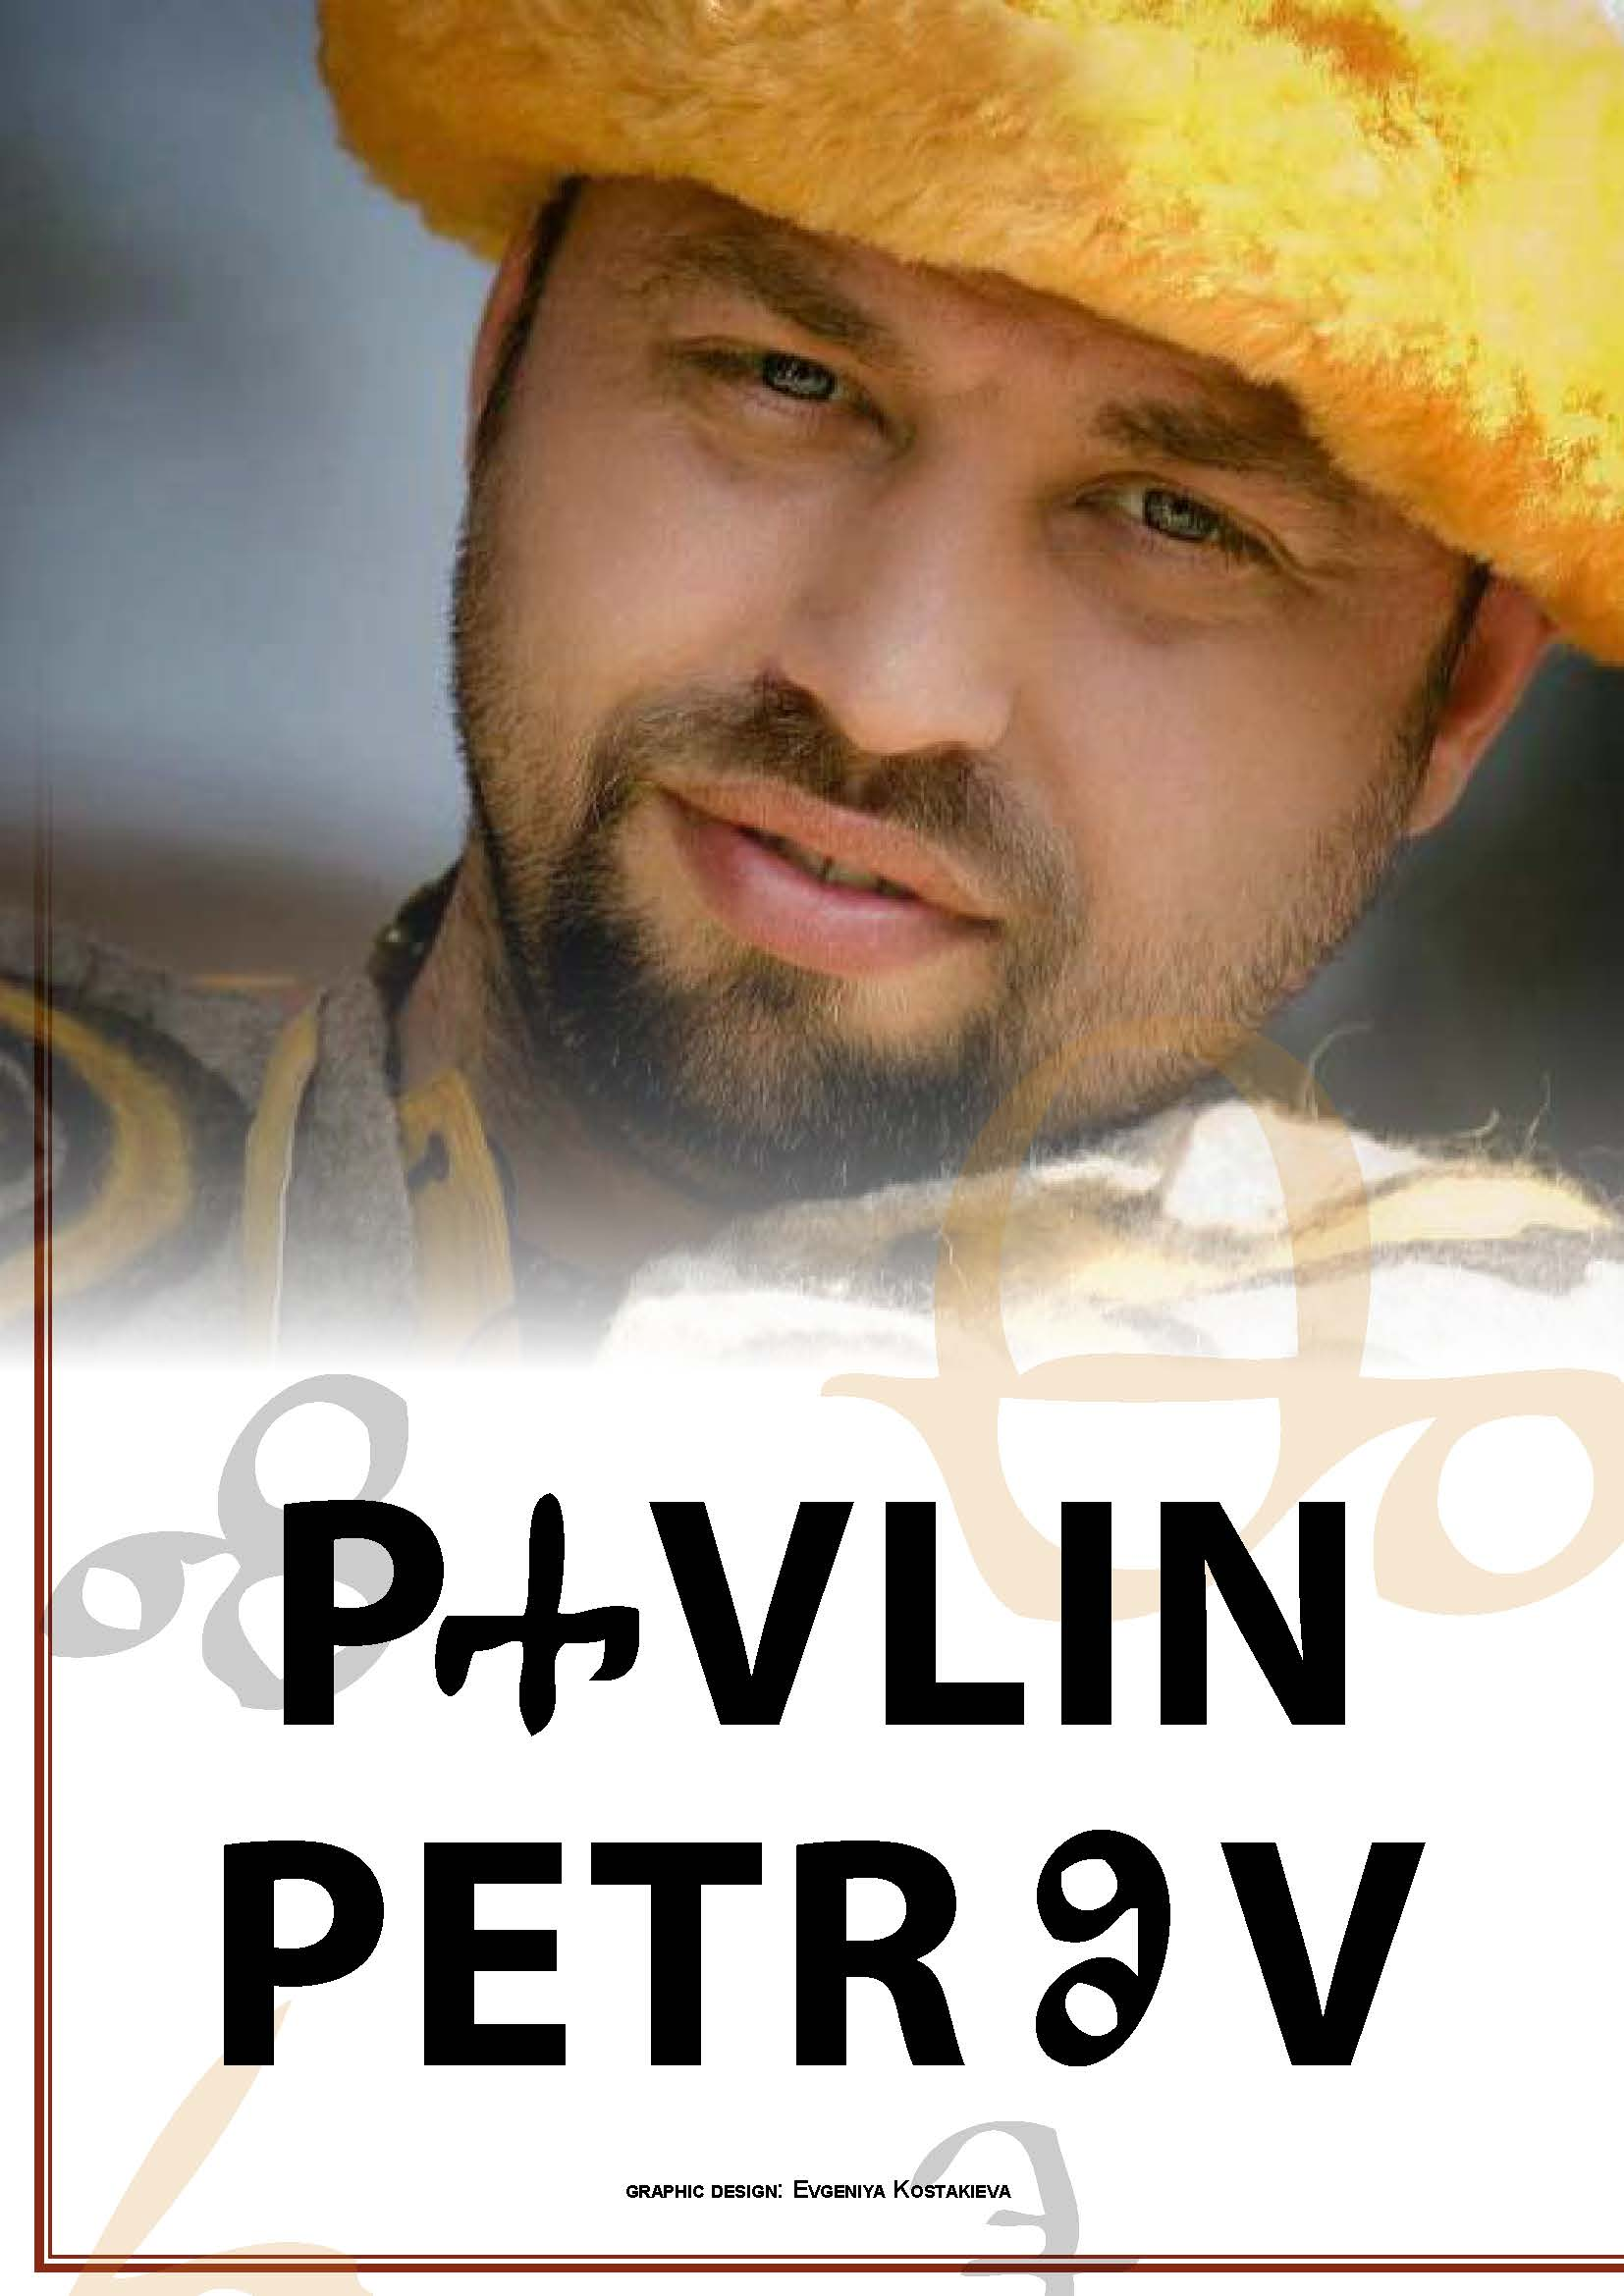 About me - Pavlin Petrov